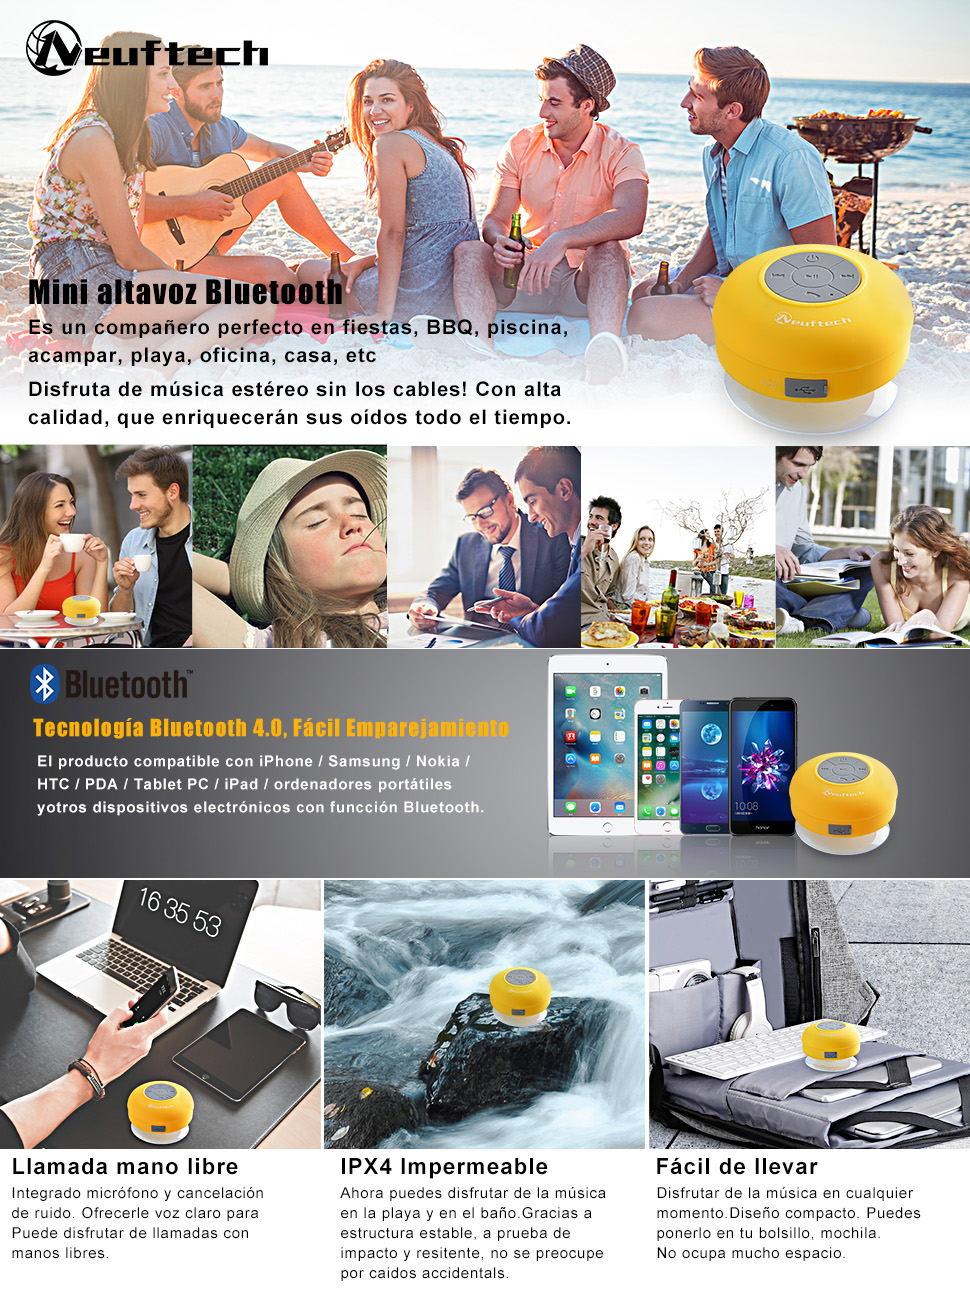 Neuftech Altavoz Bluetooth 3.0 Impermeable Sonido estéreo con Ventosa para Ducha Piscina etc(Amarillo): Amazon.es: Electrónica